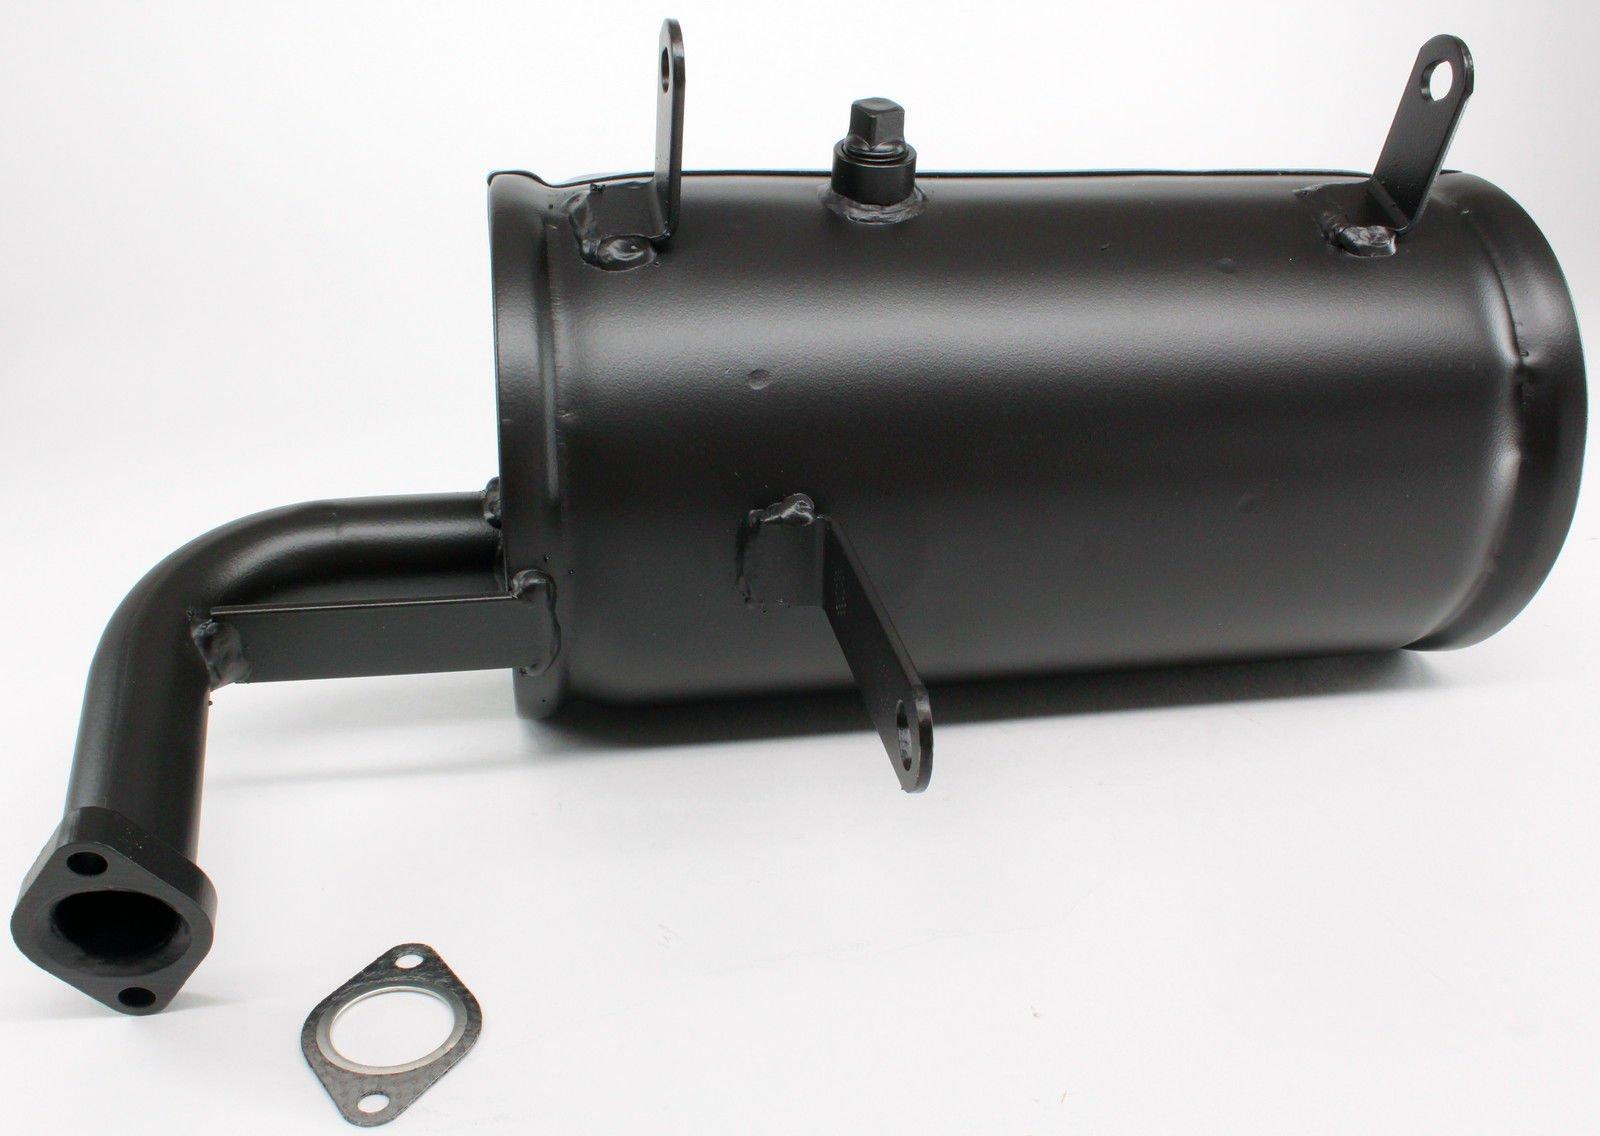 Kawasaki Mule 550 520 Muffler Exhaust and Gasket 18090-1556 11060-2079 New OEM